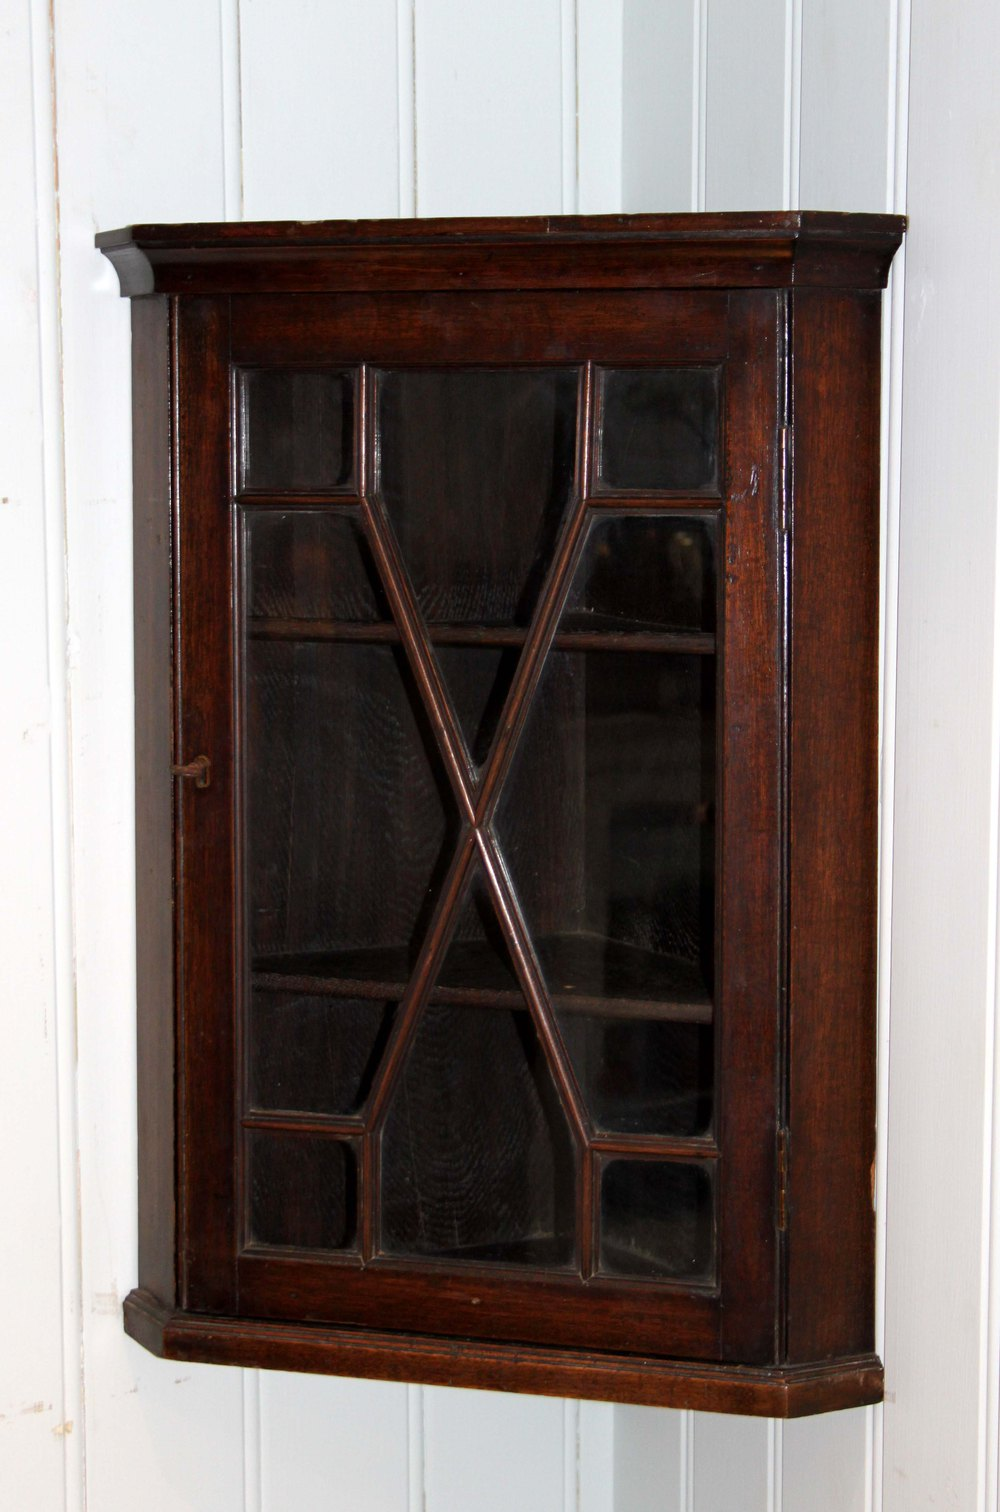 Small Mahogany Wall Mounted Corner Cabinet Antique Wall Cabinets ... - Small Mahogany Wall Mounted Corner Cabinet - Antiques Atlas